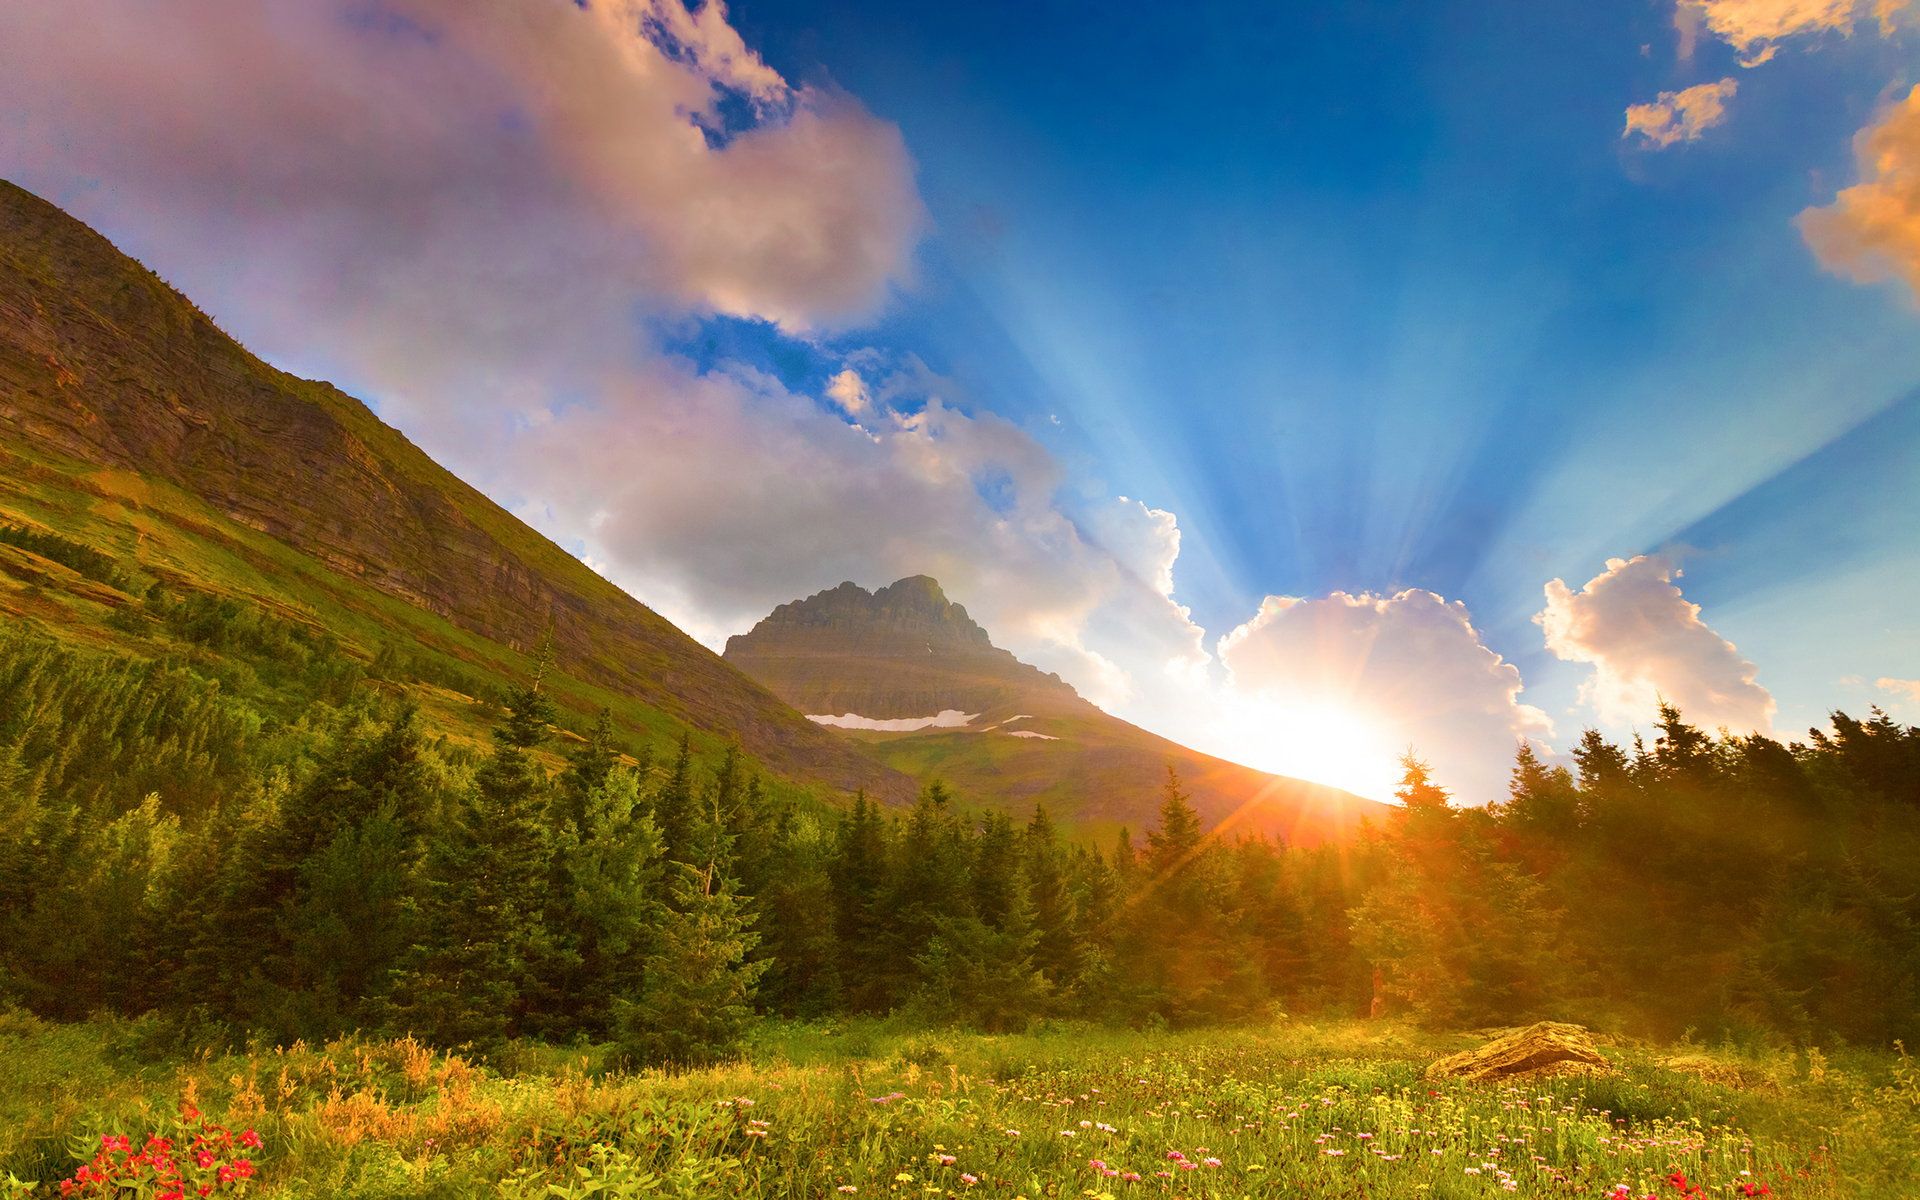 Sunrise Mountain Scenery Wallpaper